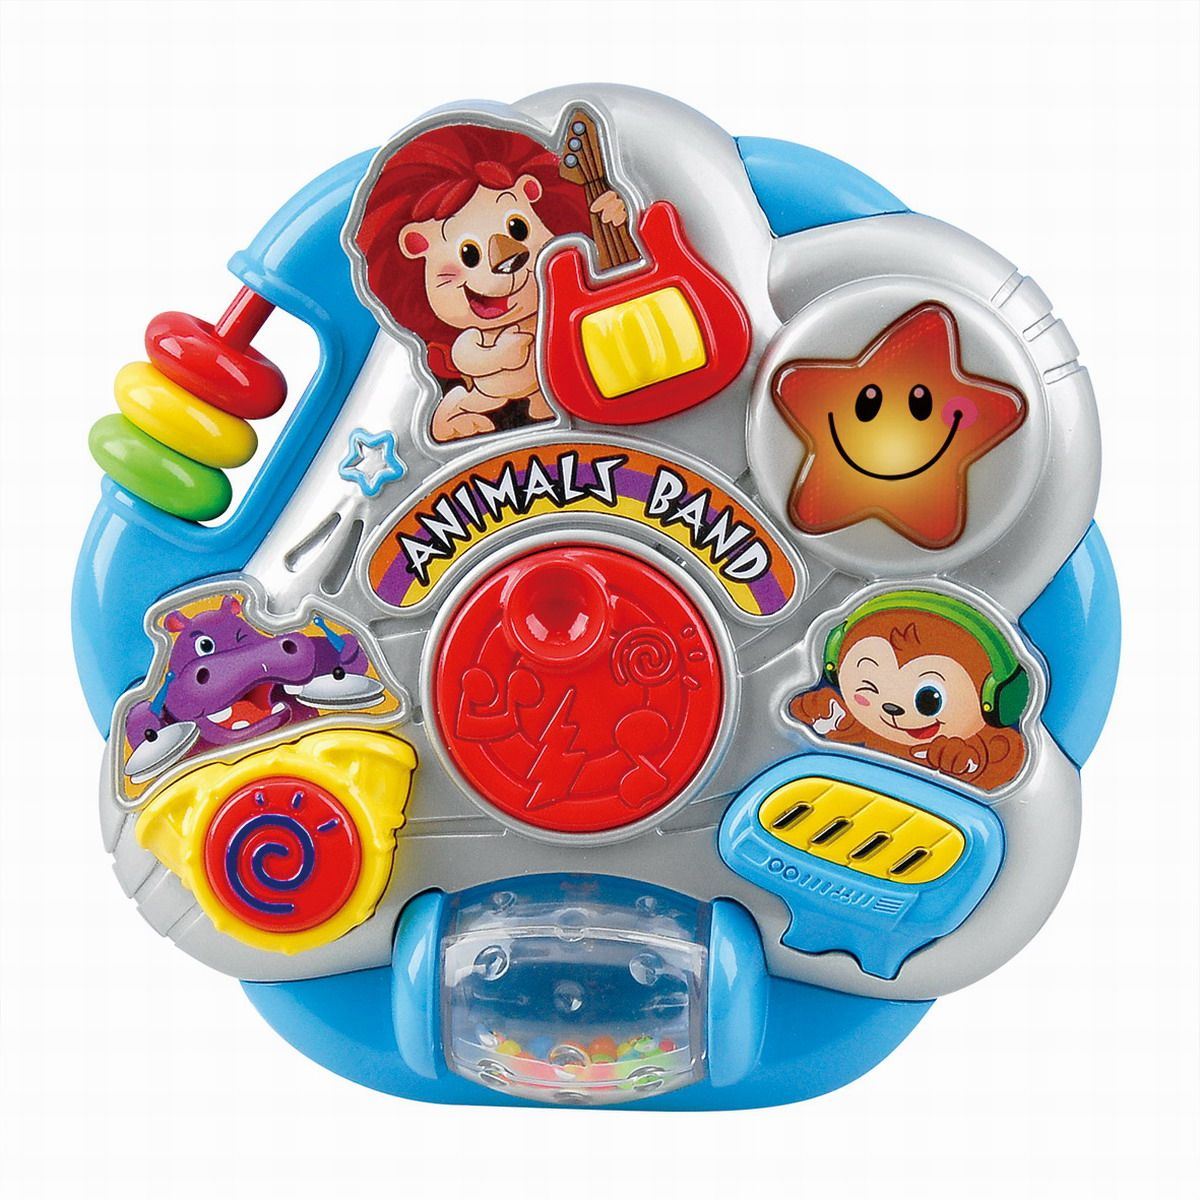 Playgo Развивающая игрушка Оркестр с животными